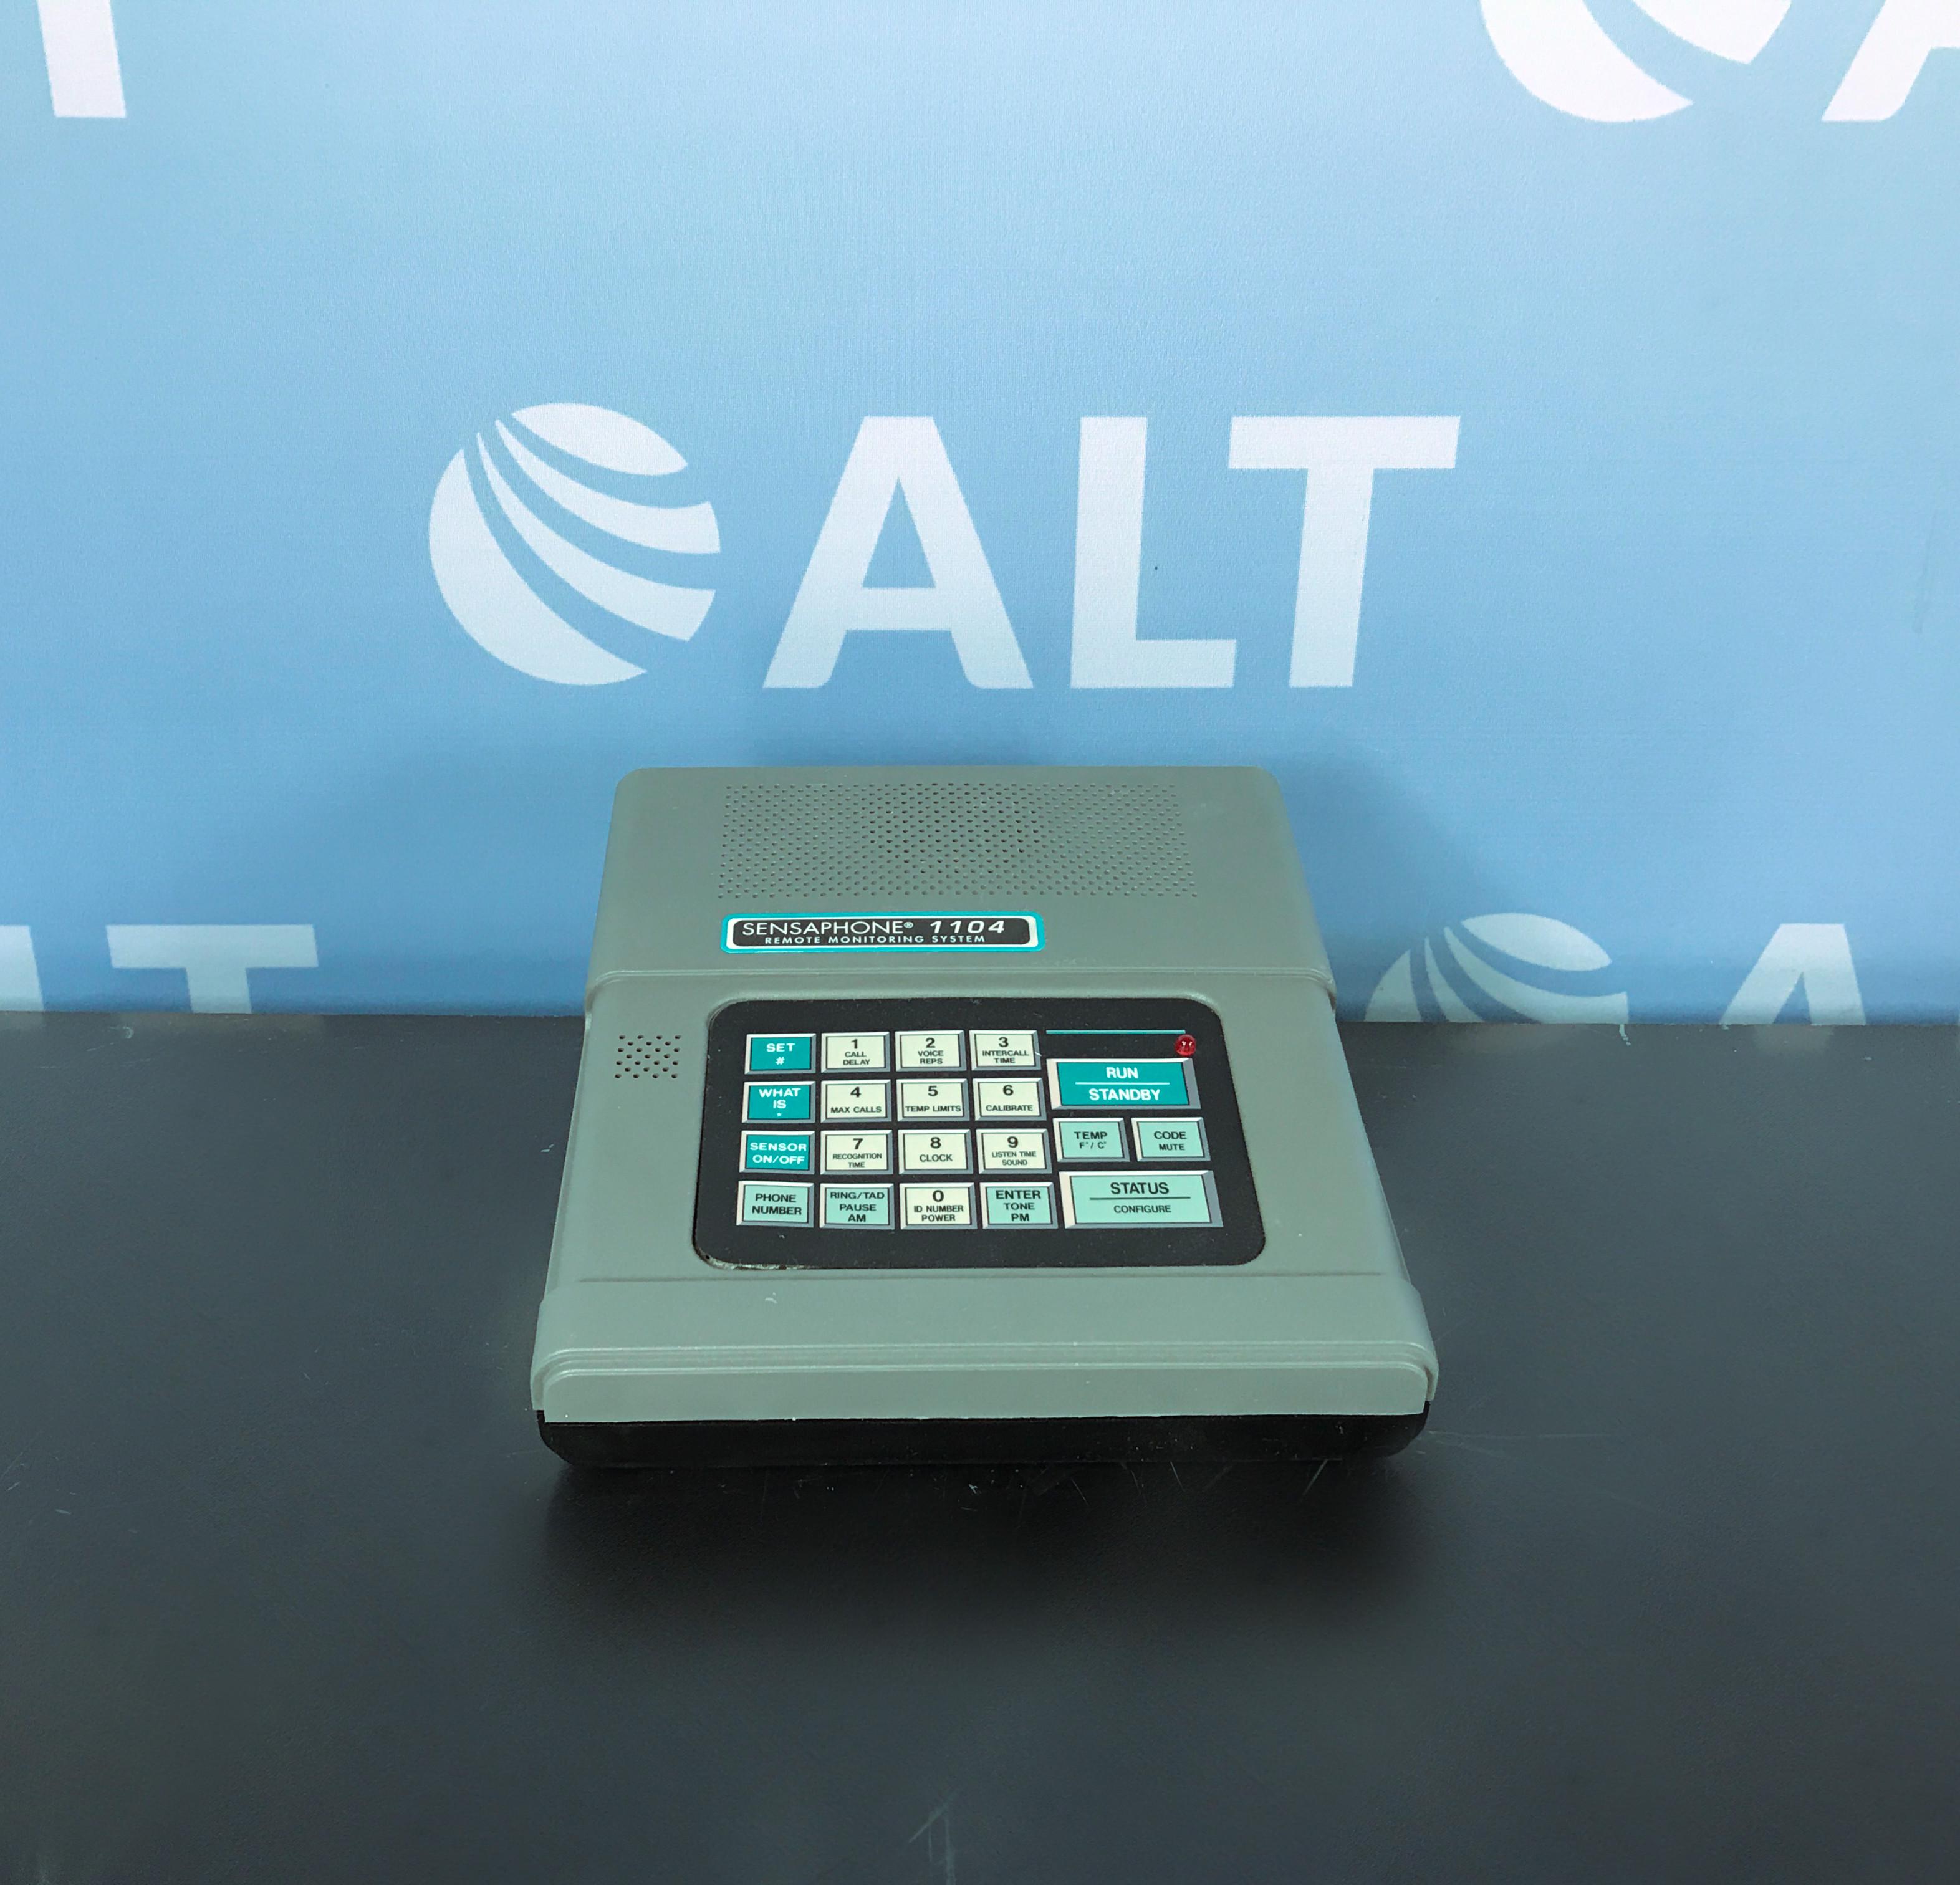 Sensaphone Model 1104 Remote Monitoring System Image